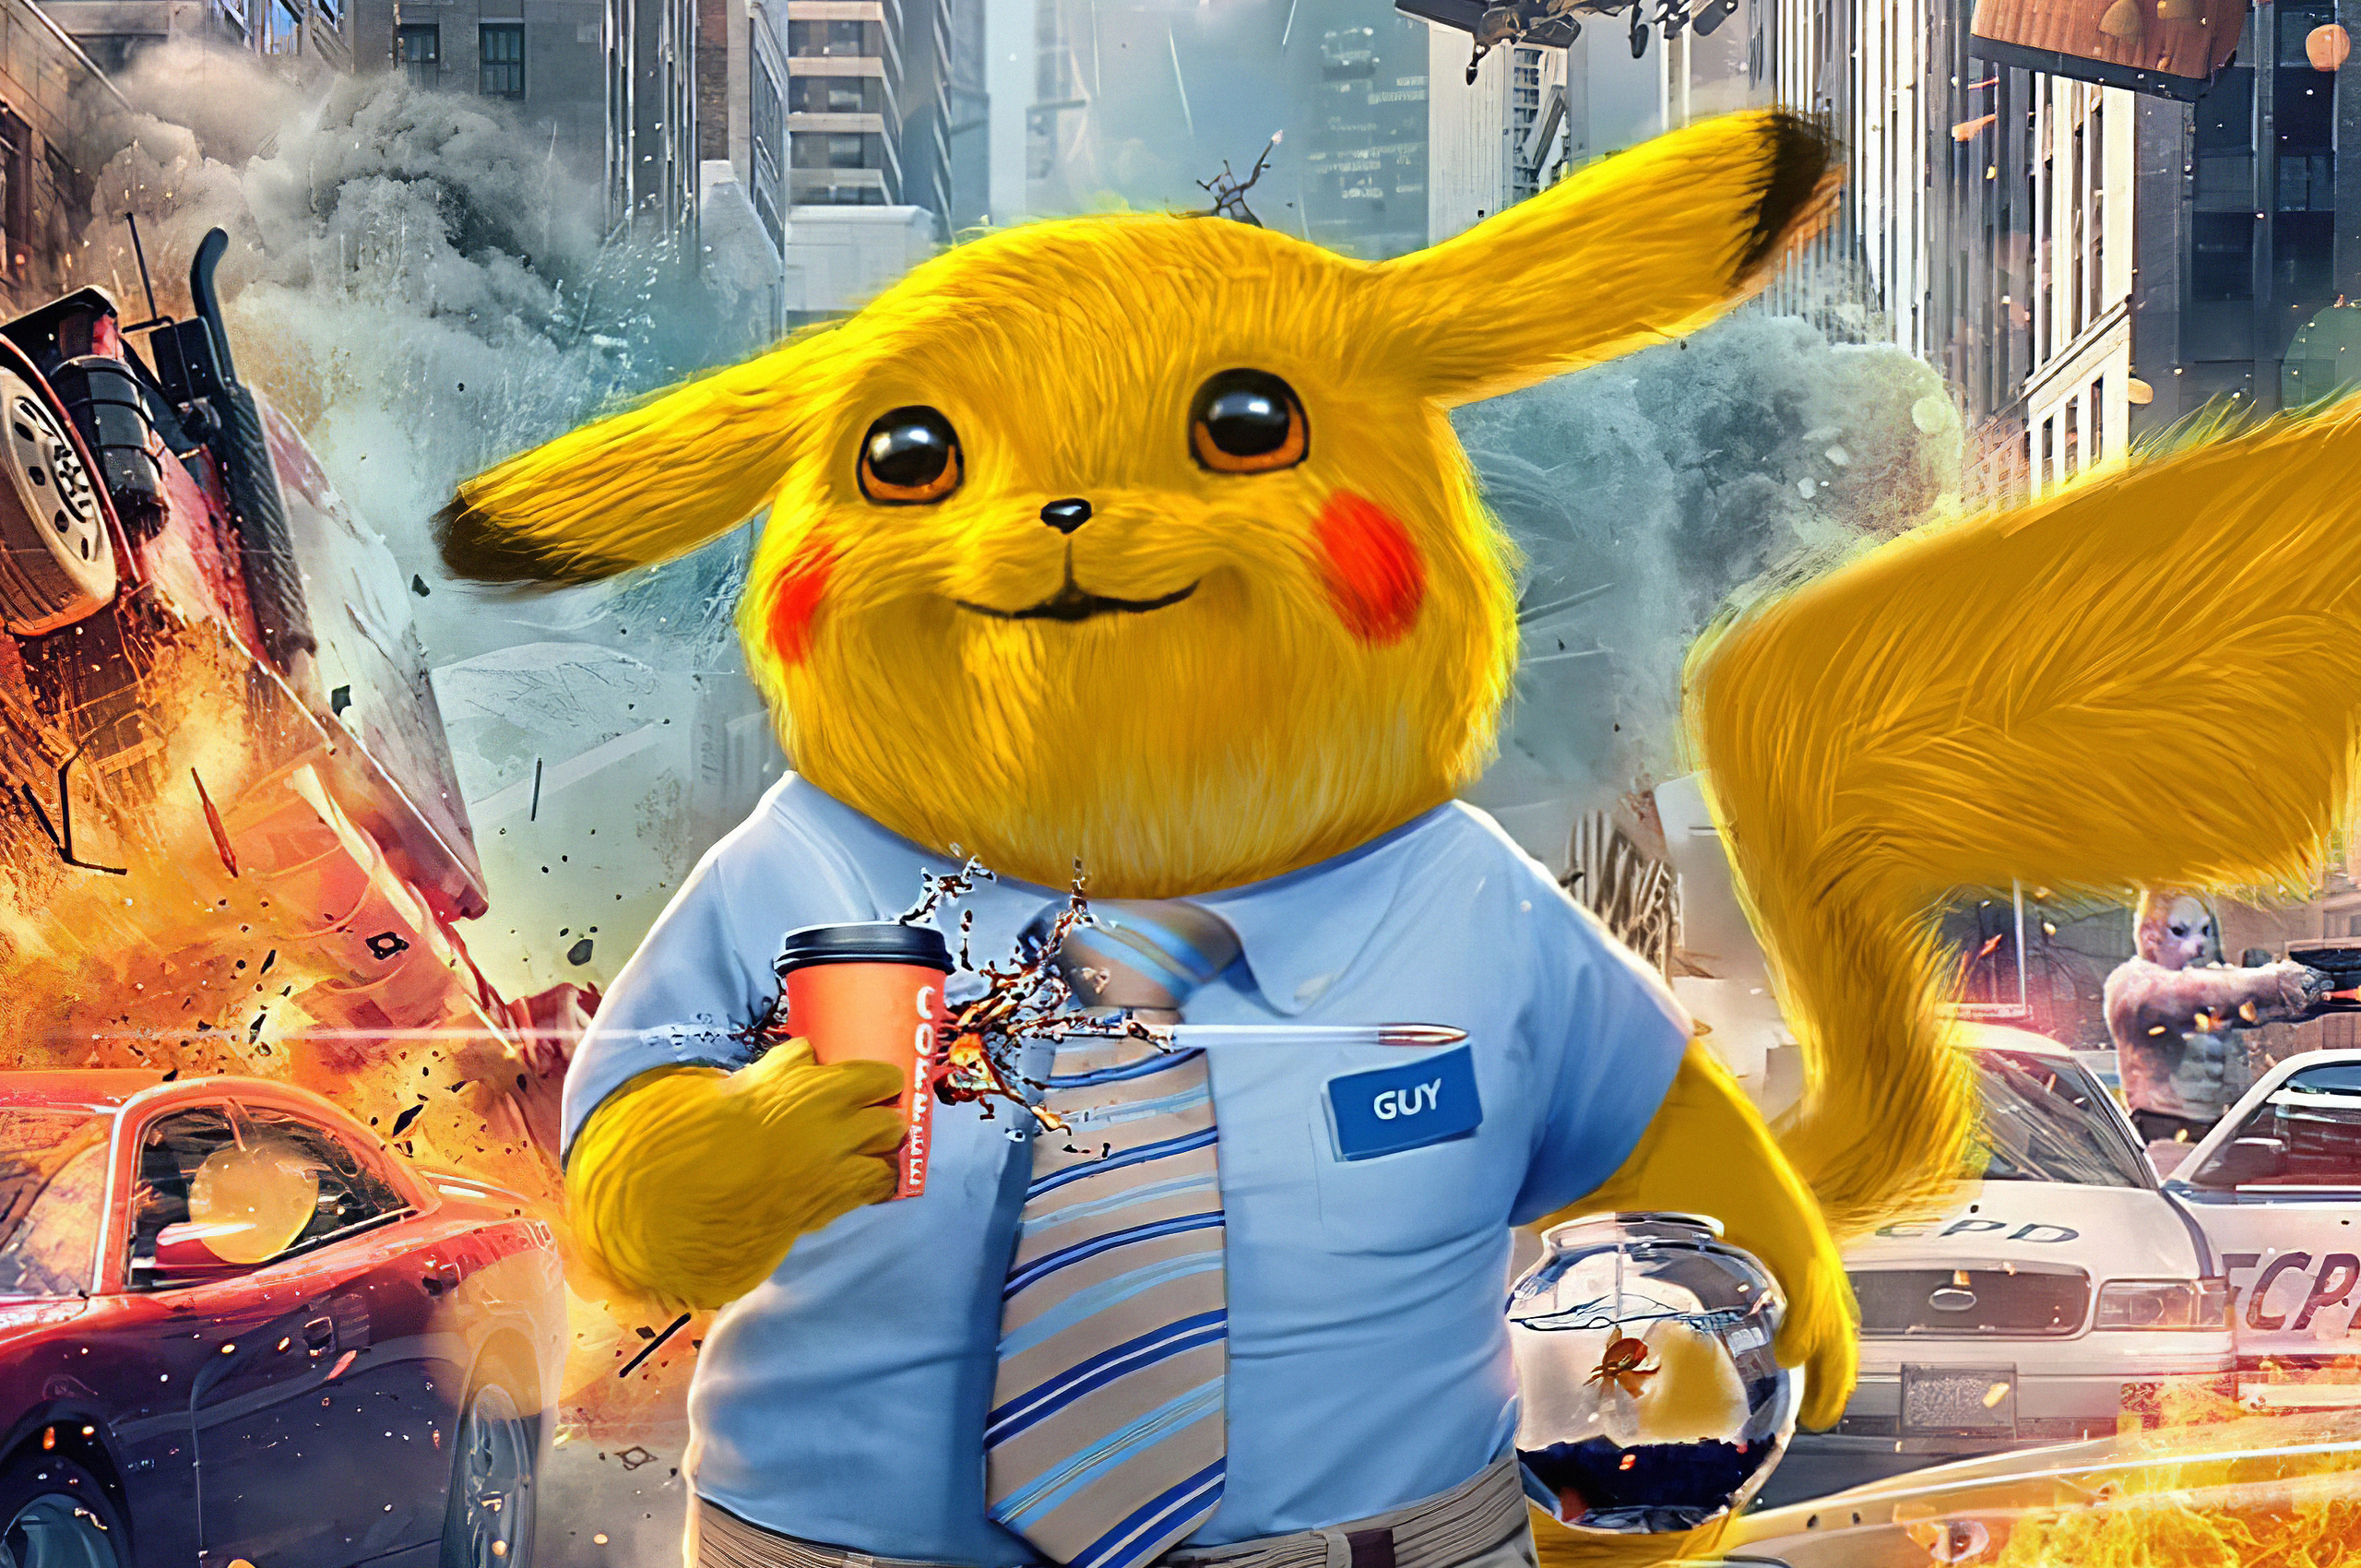 pikachu-free-guy-2j.jpg